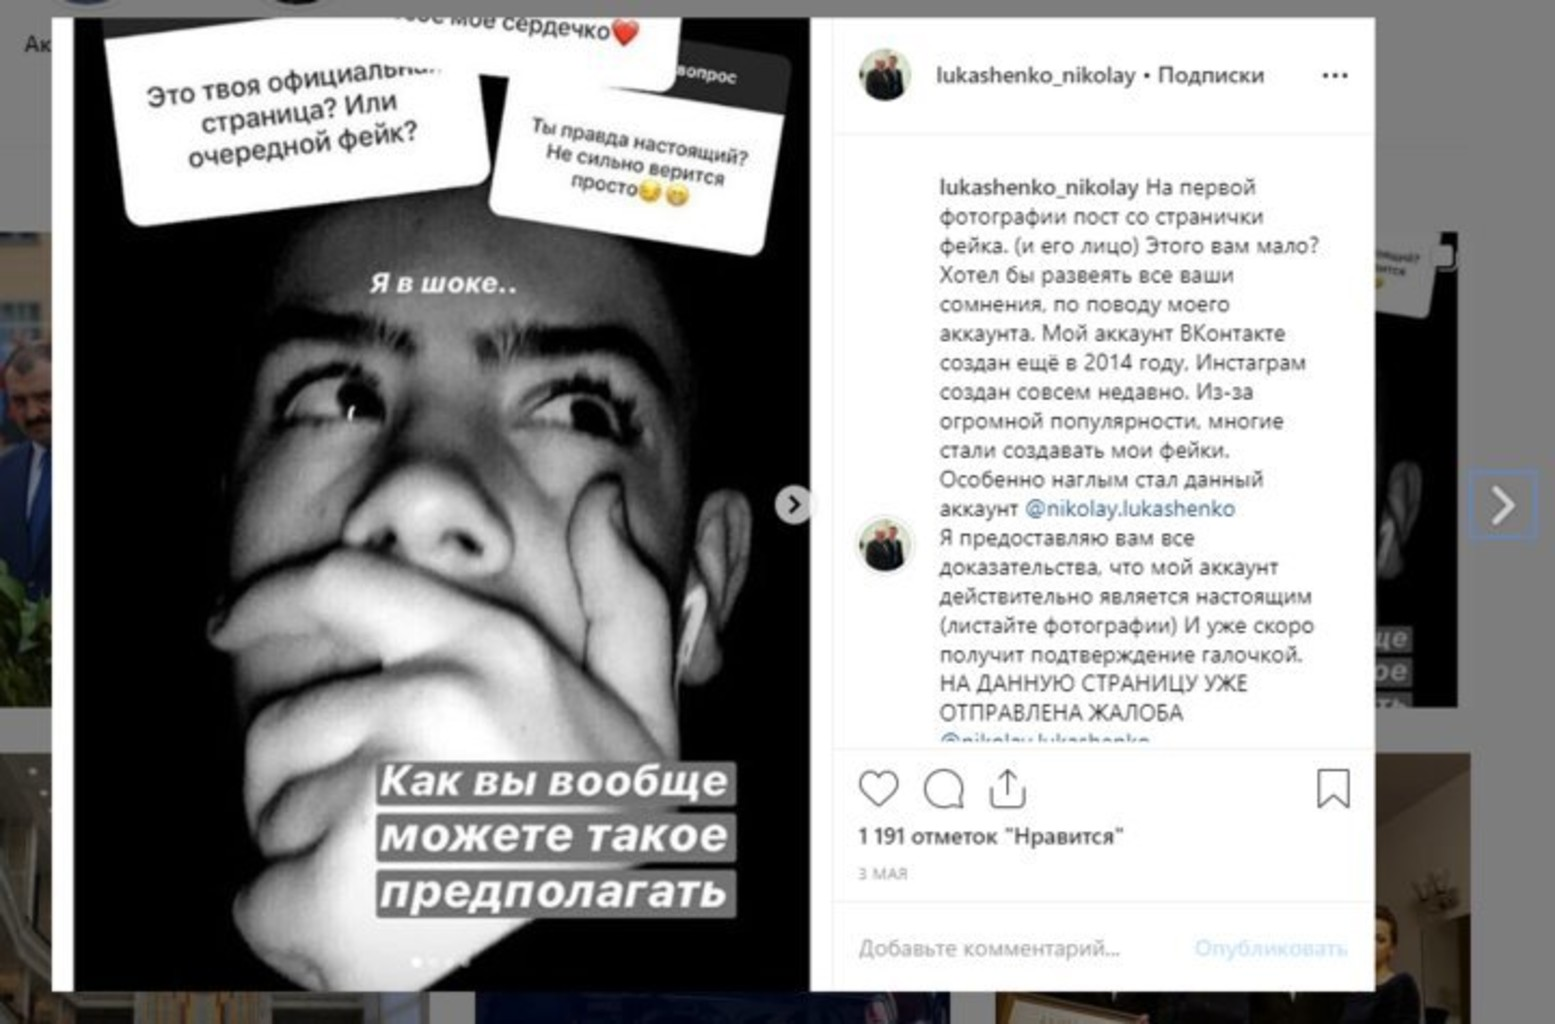 Instagram nikolaya lukashenko 5